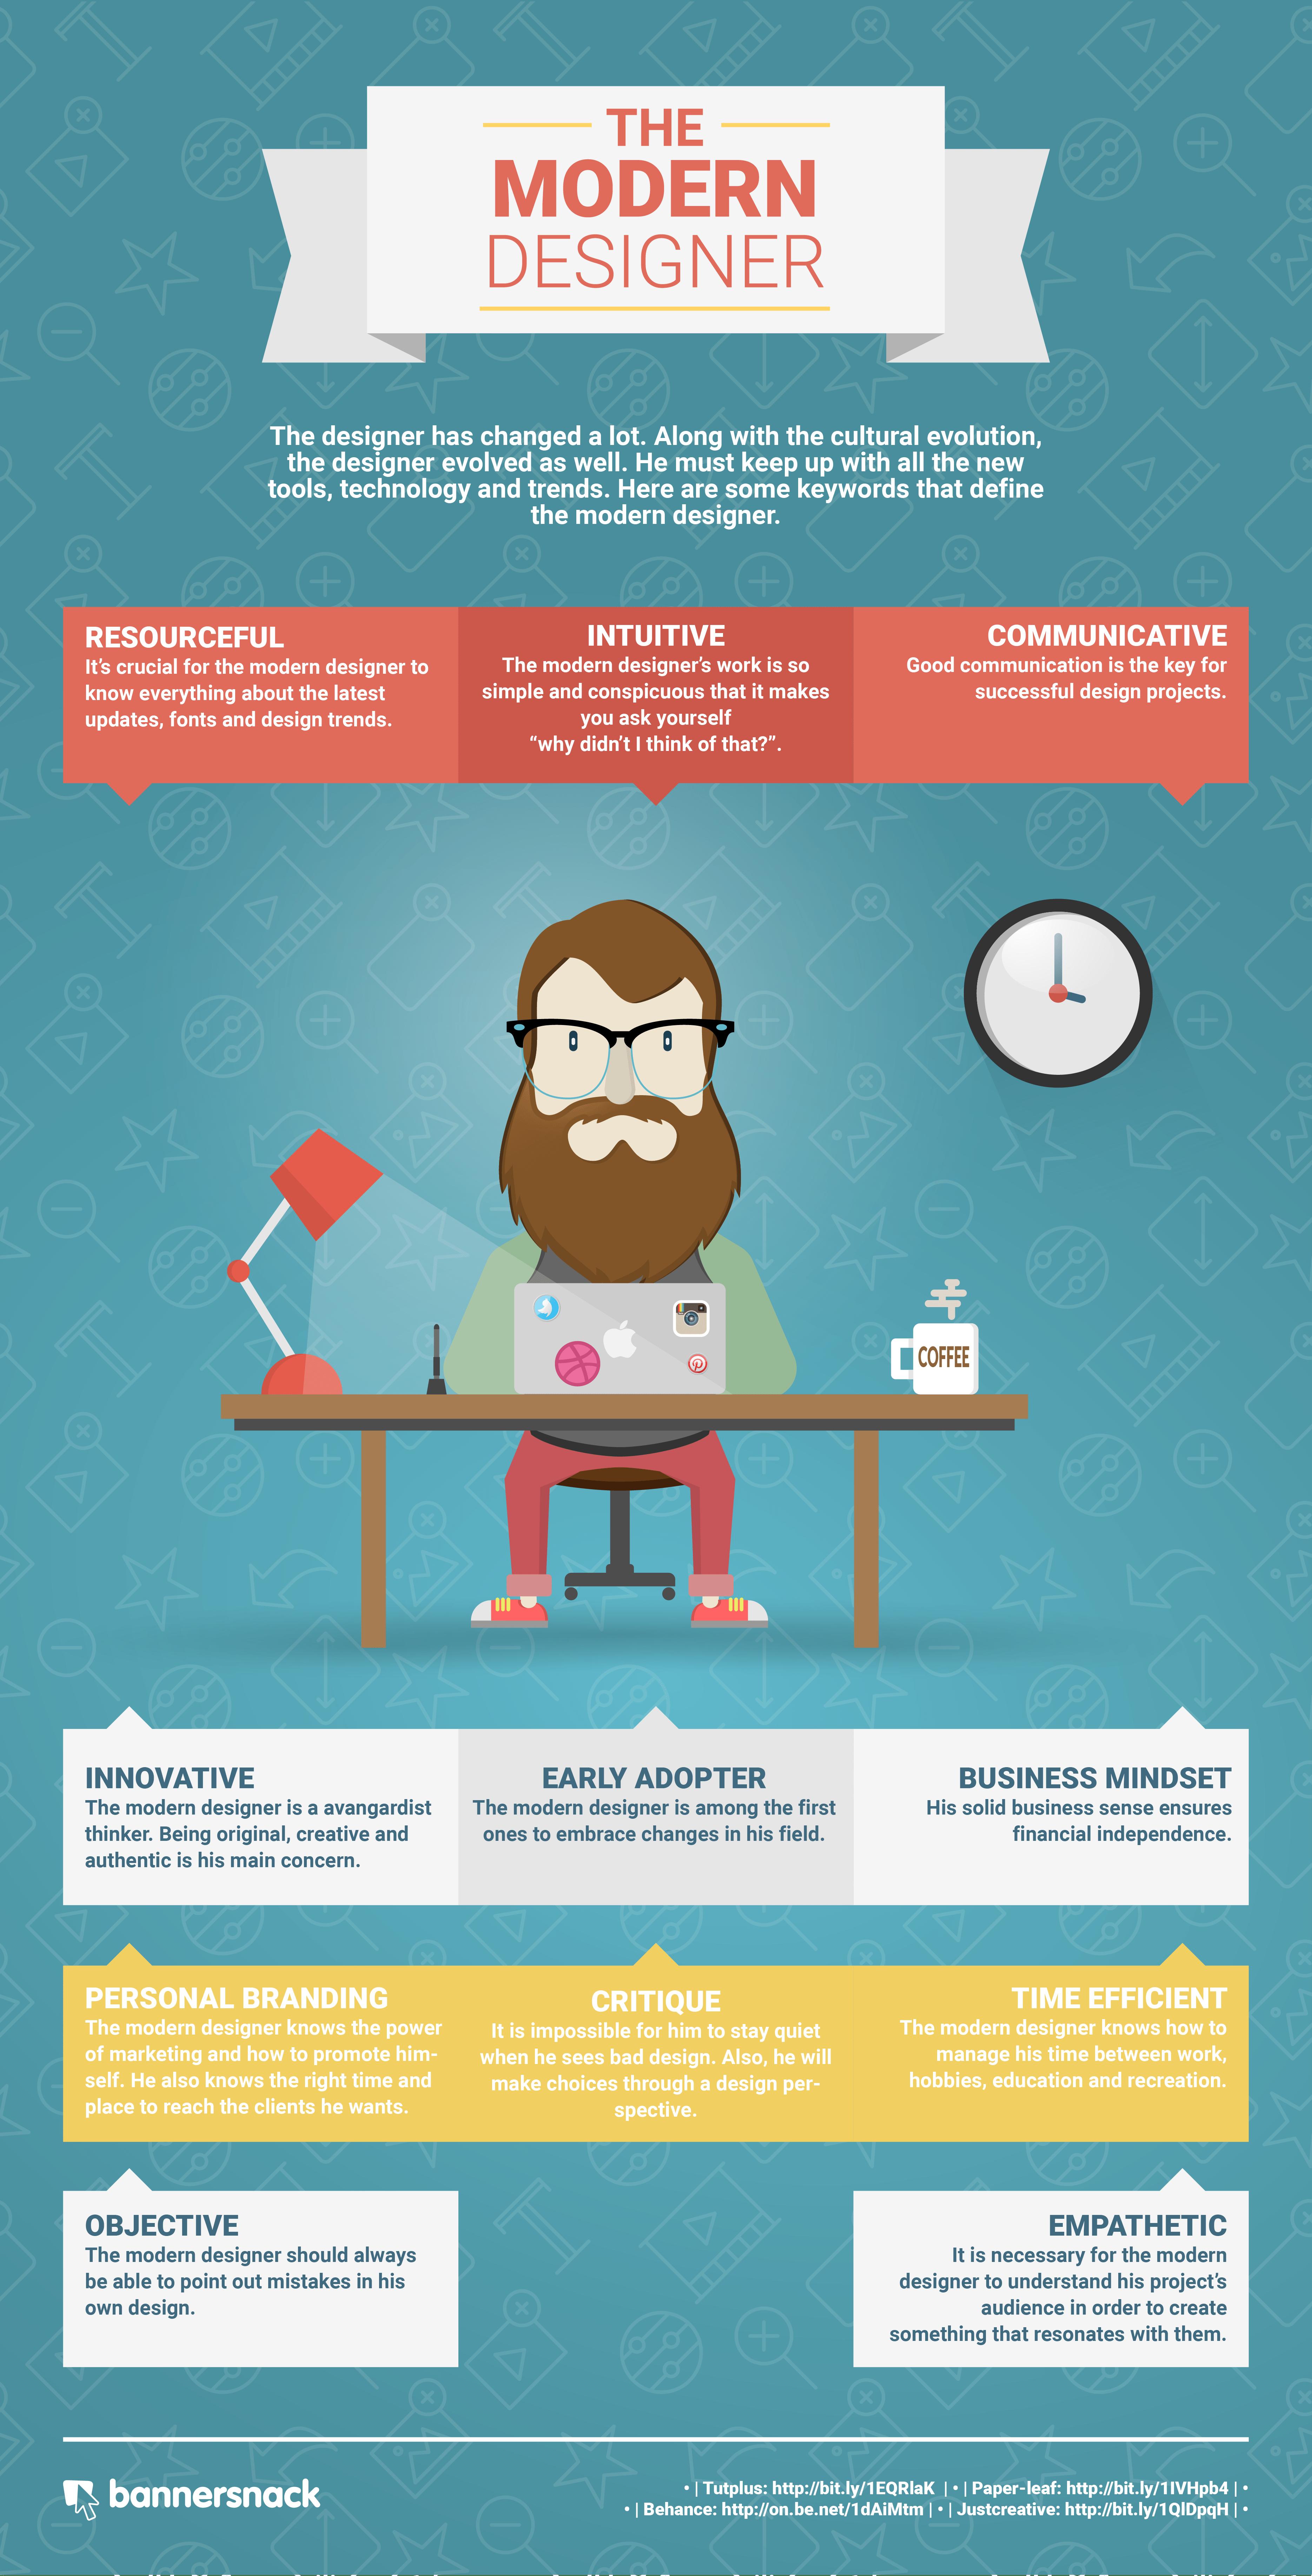 Infographic The Modern Designer